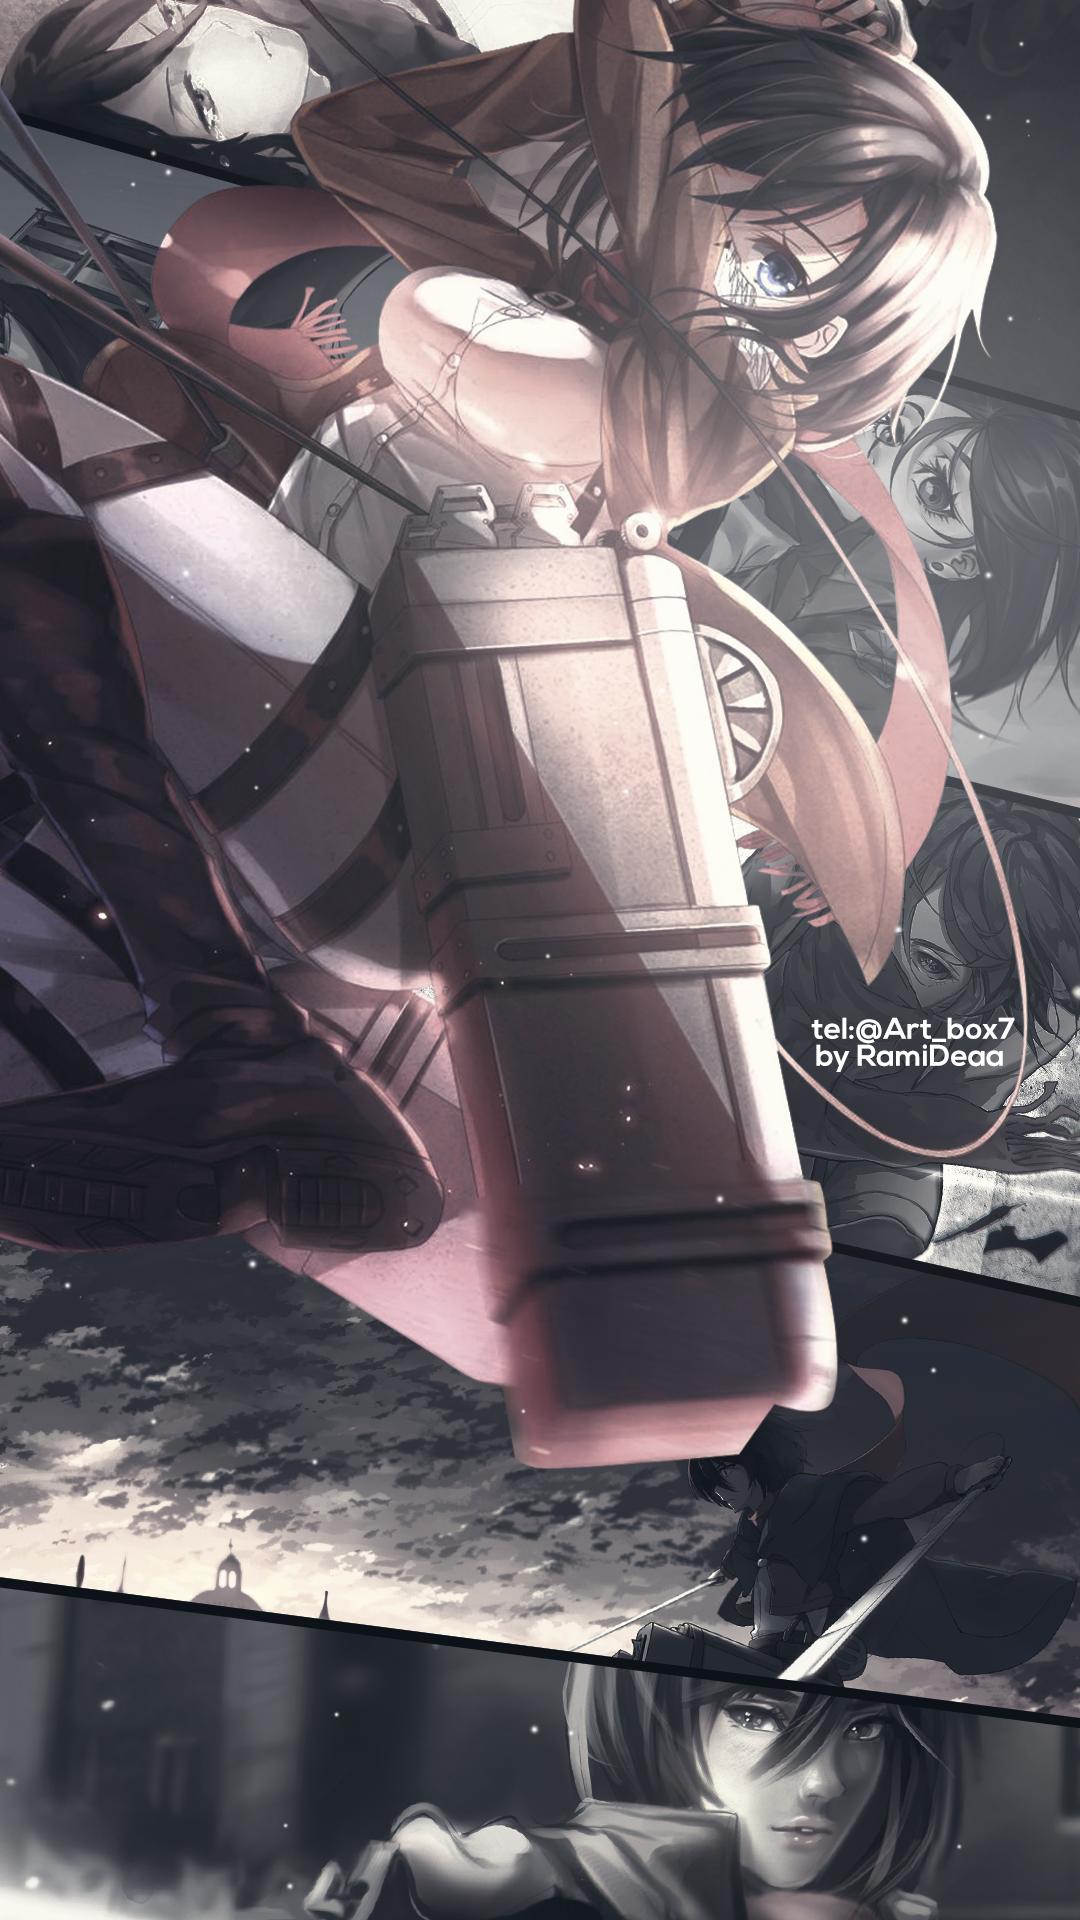 mikasa エレミカ, 三笠, 進撃の巨人